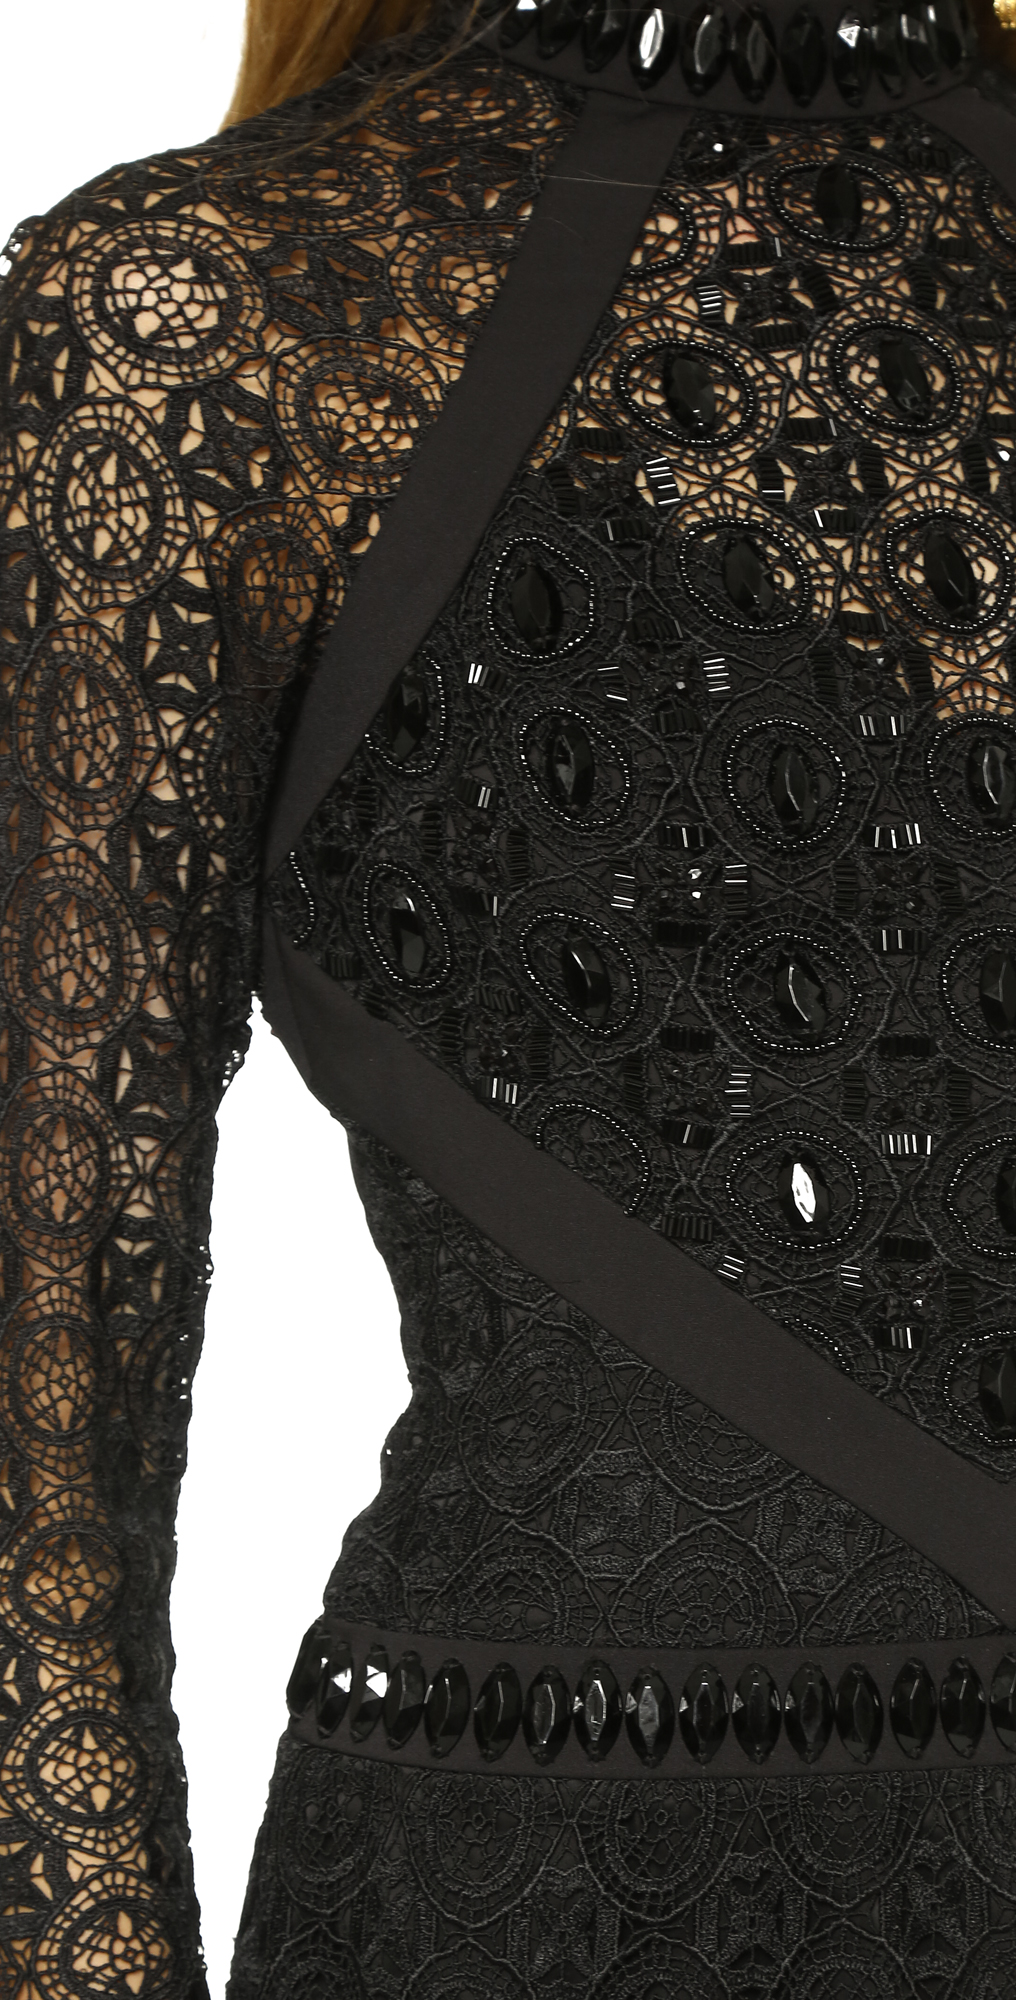 Sass Bide The Folding Star Dress Shopbop